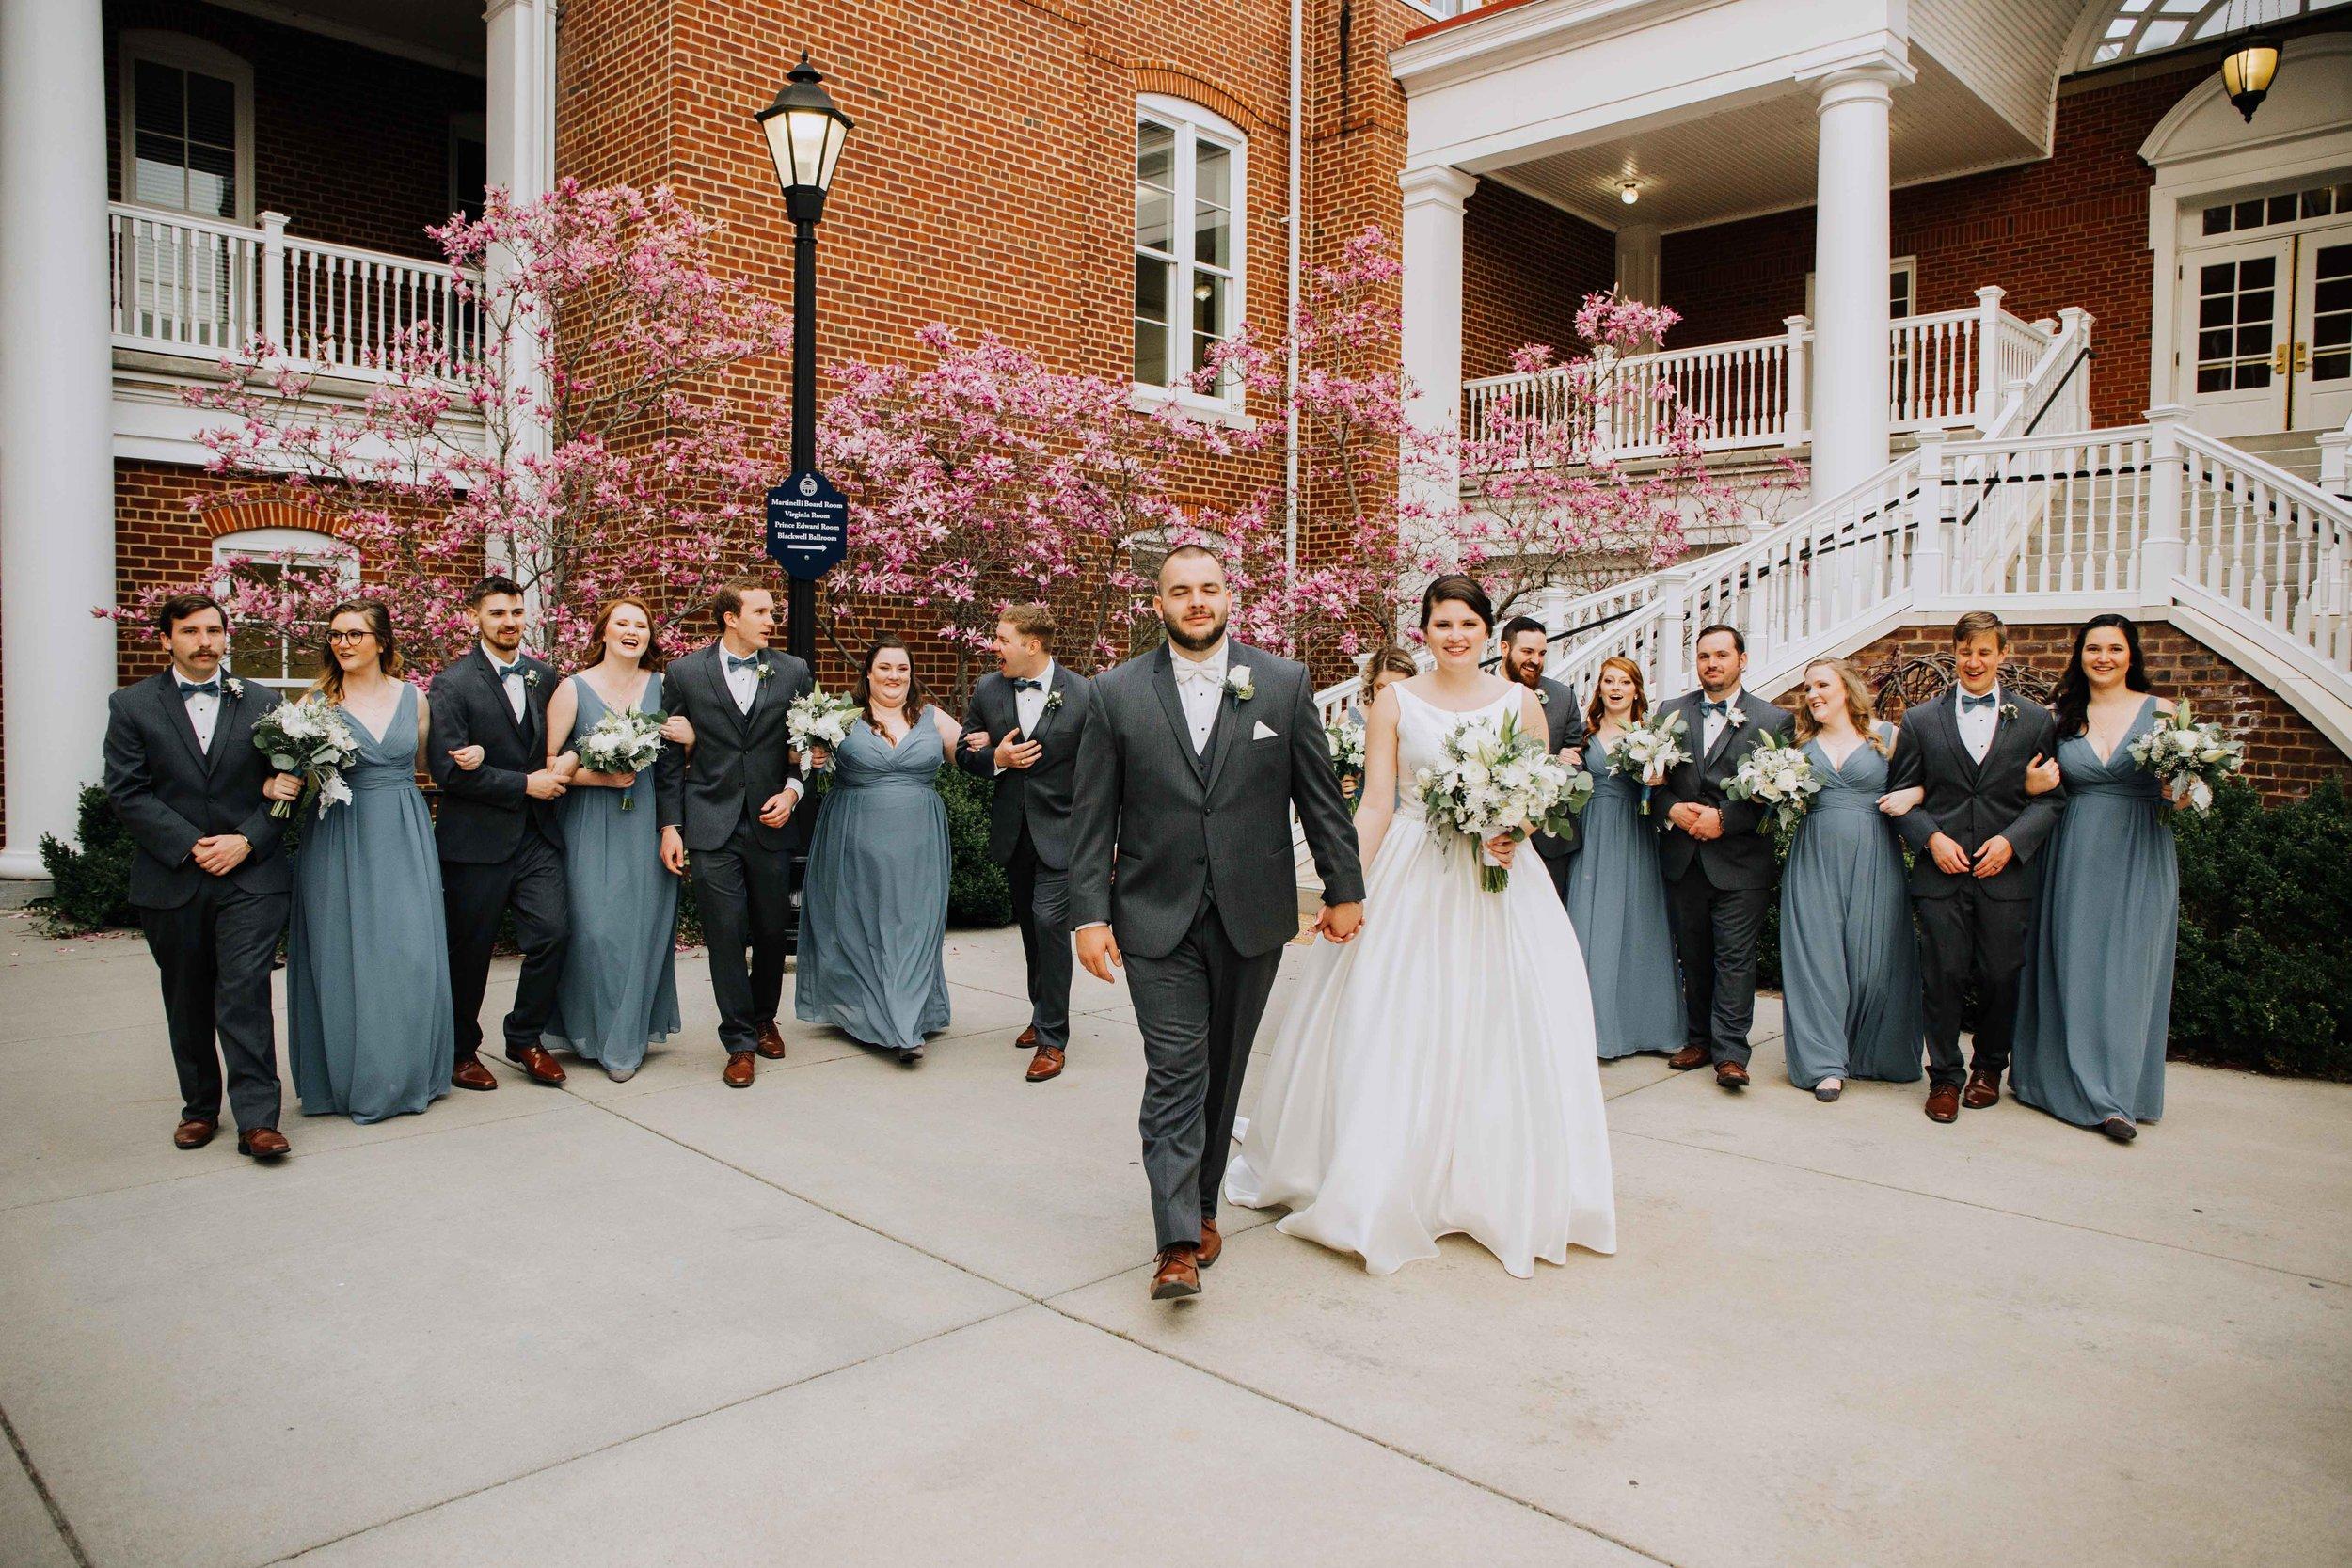 Farmville-Virginia-Wedding-Hotel-Weynoke-Downtown-Jacqueline-Waters-Photography-Detailed- (1133).jpg